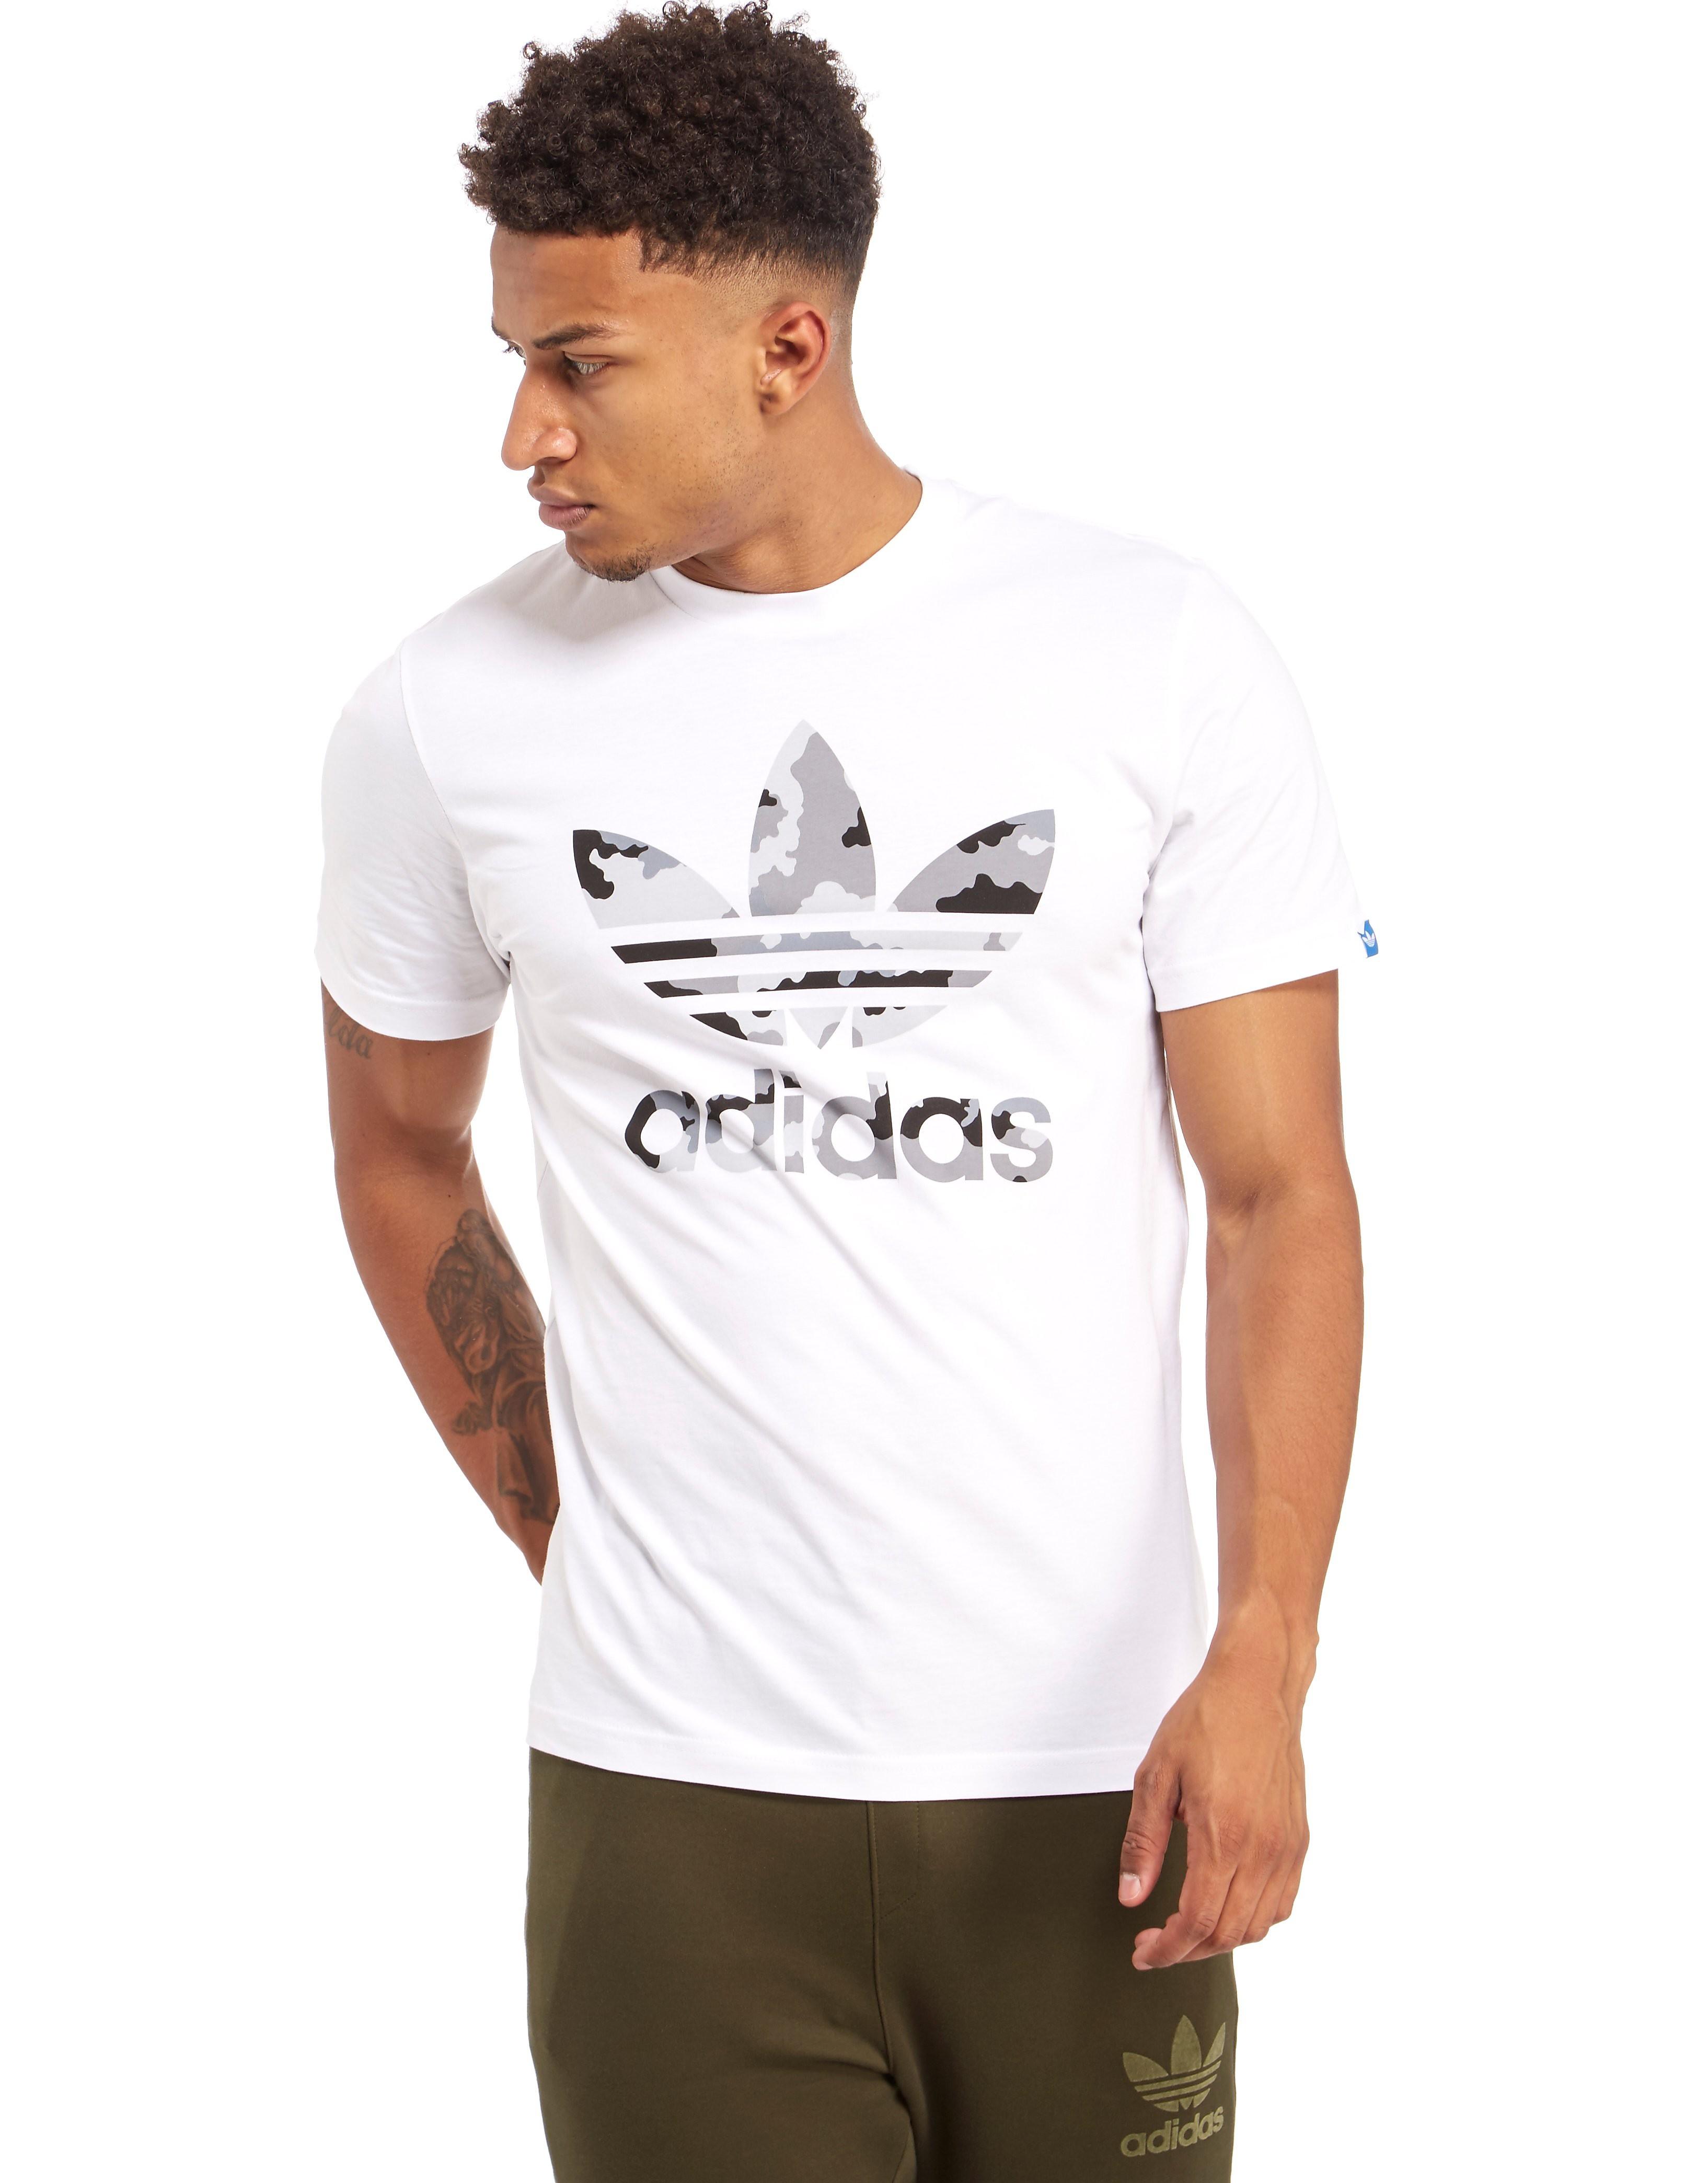 adidas Originals Camo Infill T-Shirt